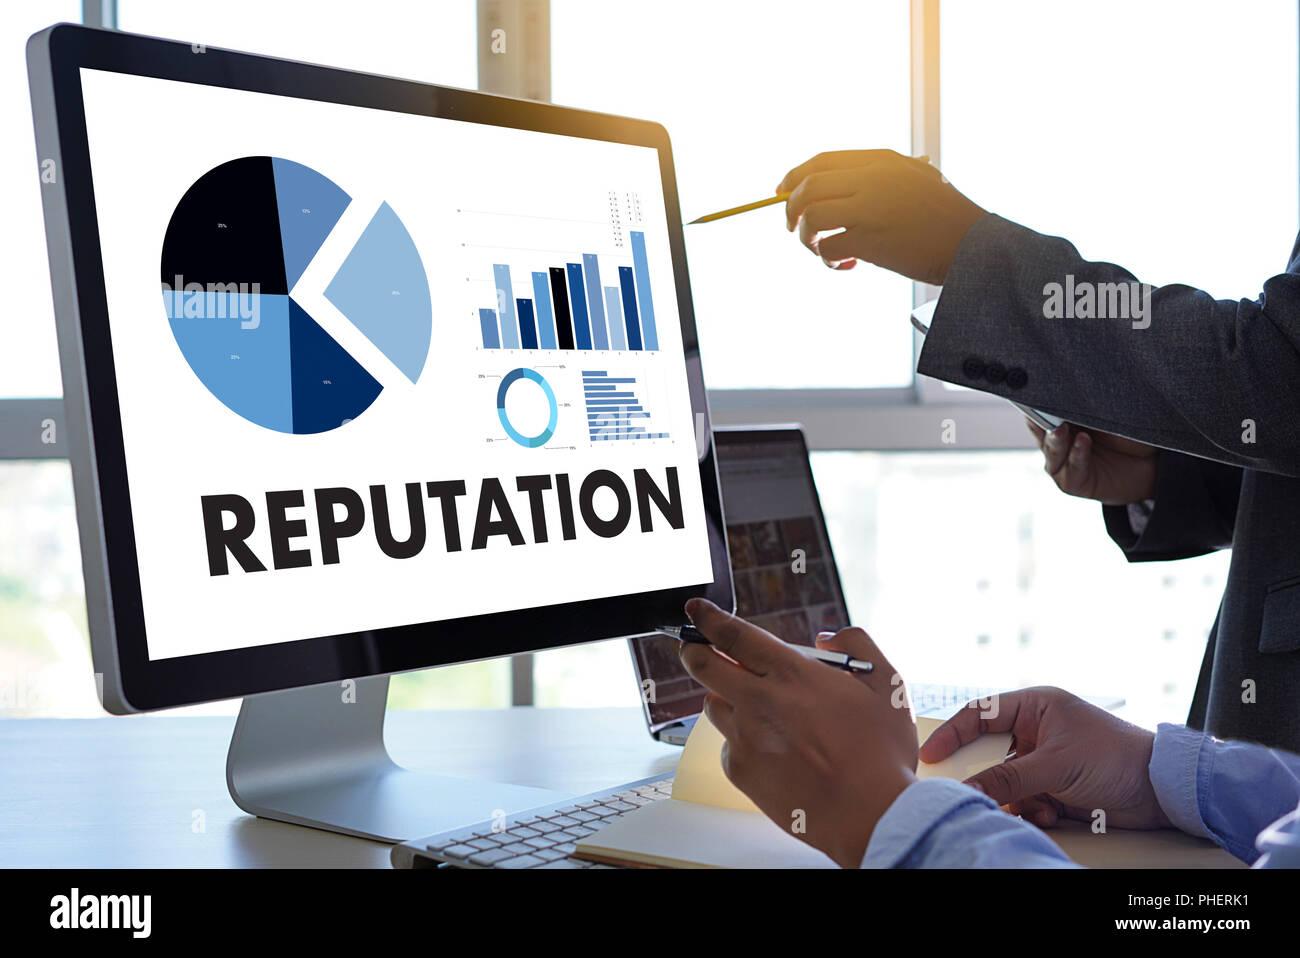 REPUTATION Popular Ranking Honor Reputation management Branding Concept - Stock Image